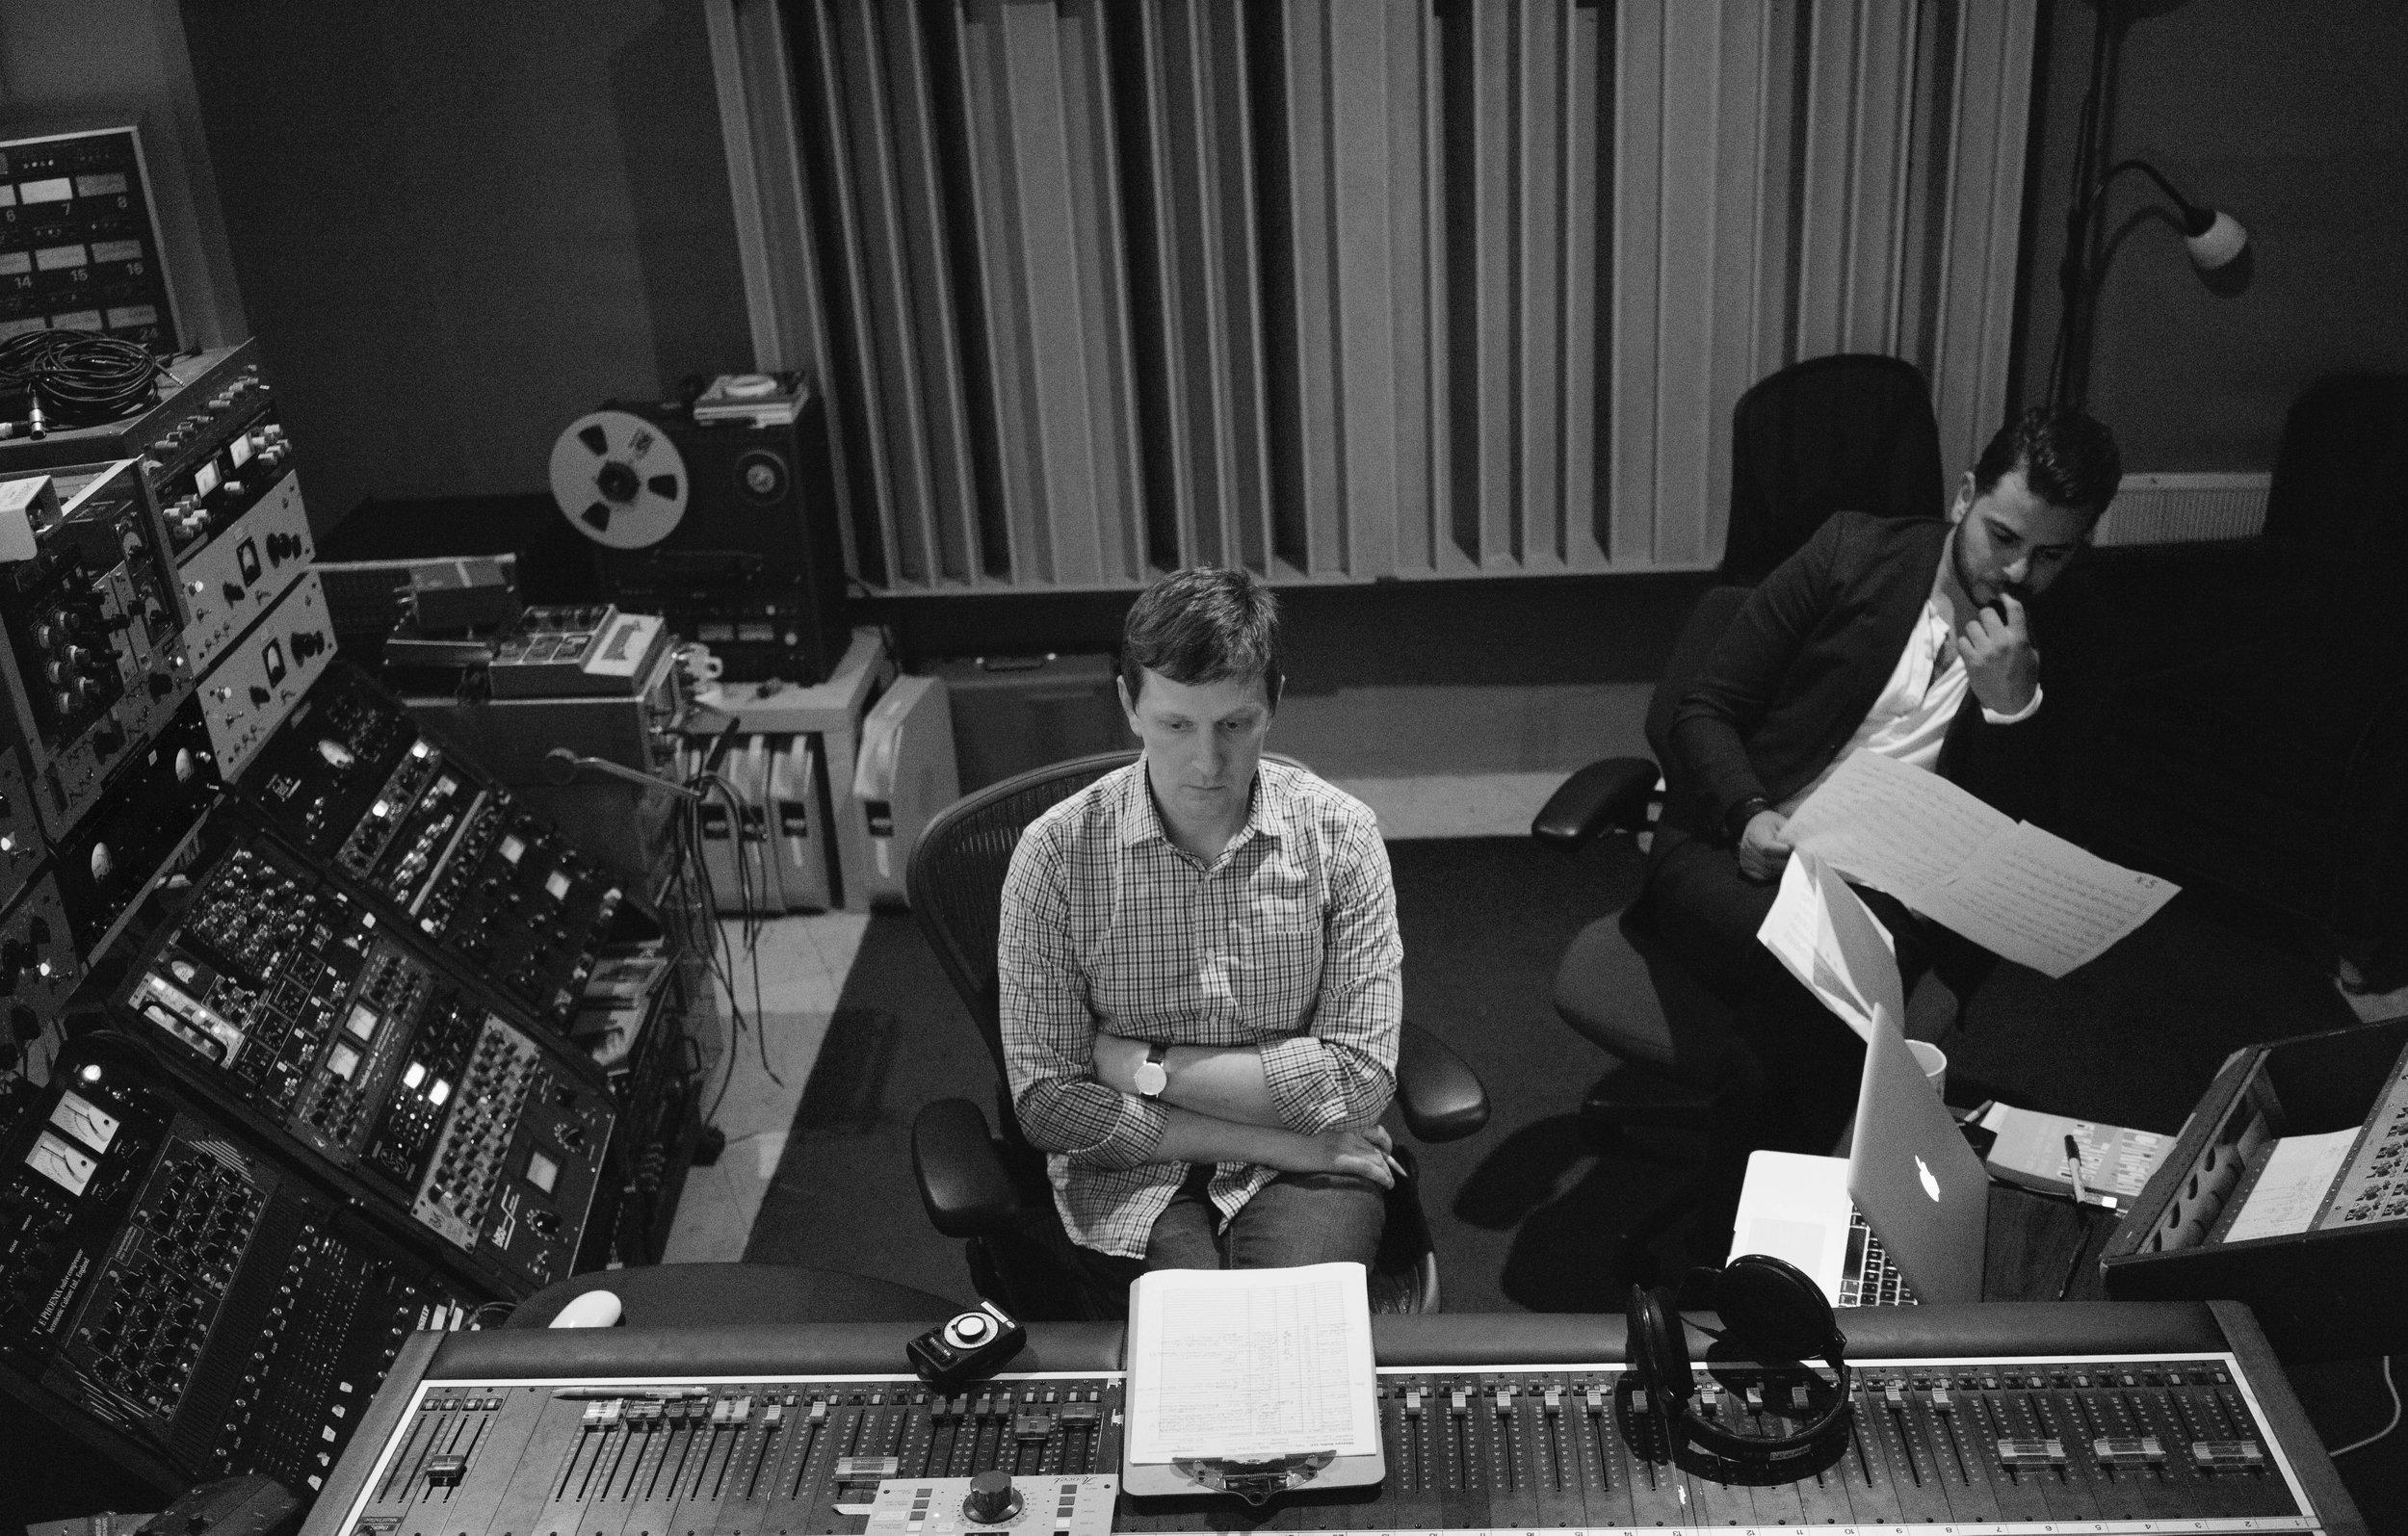 Composer Julián de la Chica & Ryan Streber at Oktaven Audio, Yonkers, NY Photo by Hassan Malik